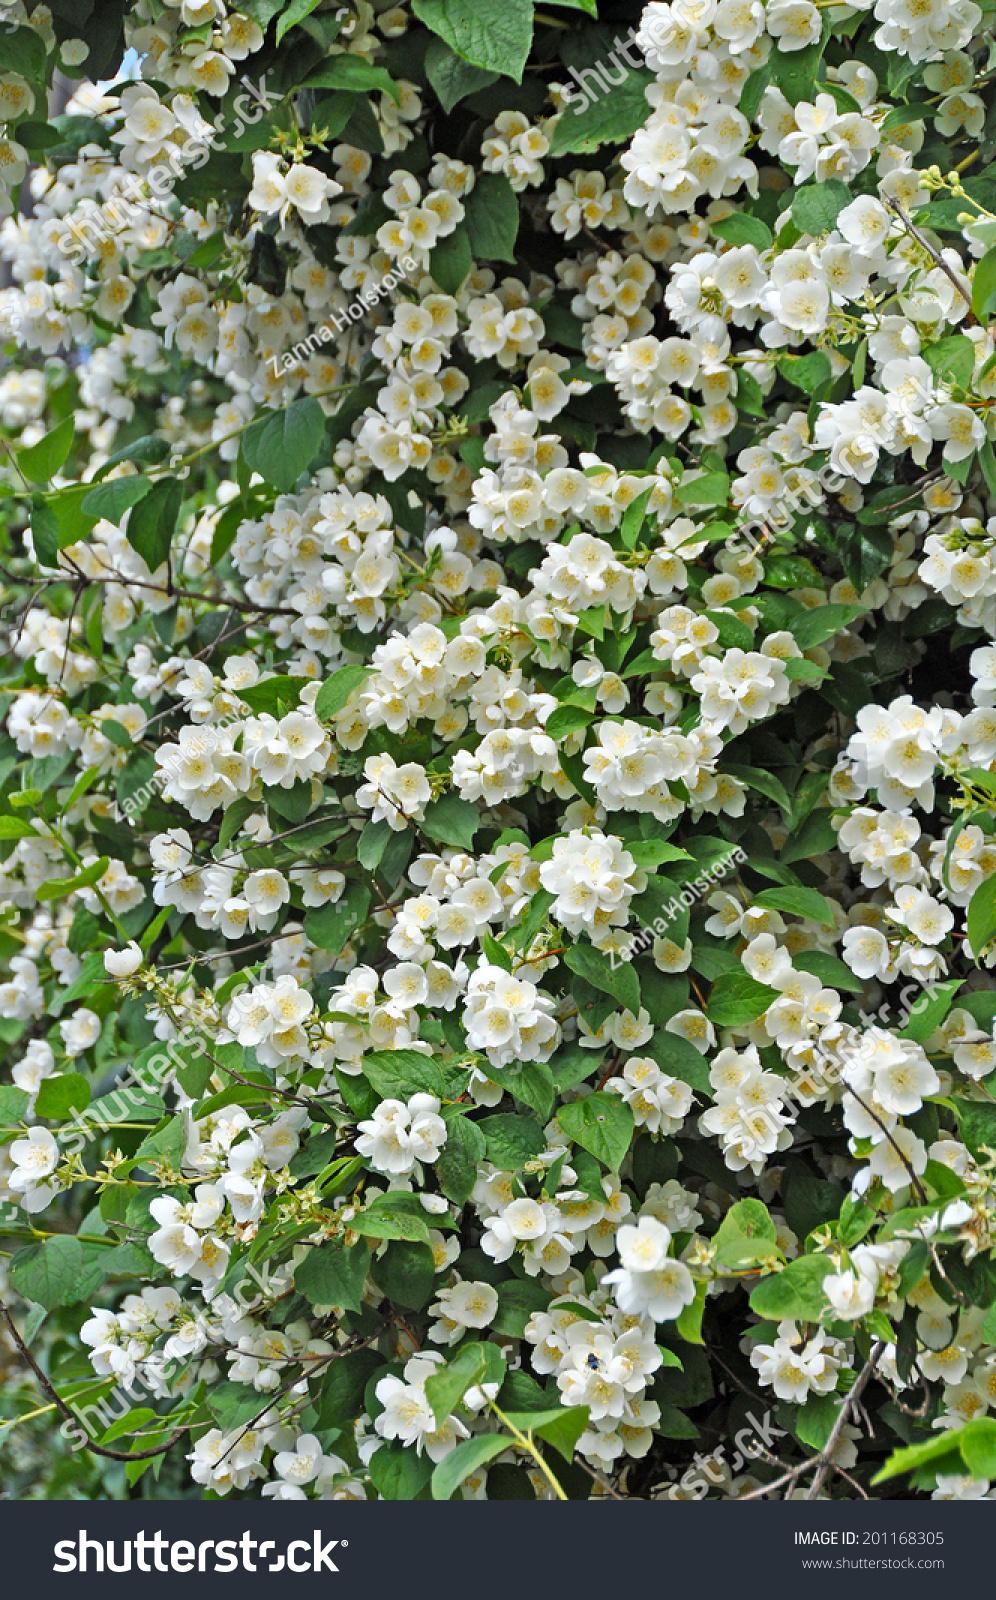 Jasmine flower growing on bush garden stock photo edit now jasmine flower growing on the bush in garden floral background izmirmasajfo